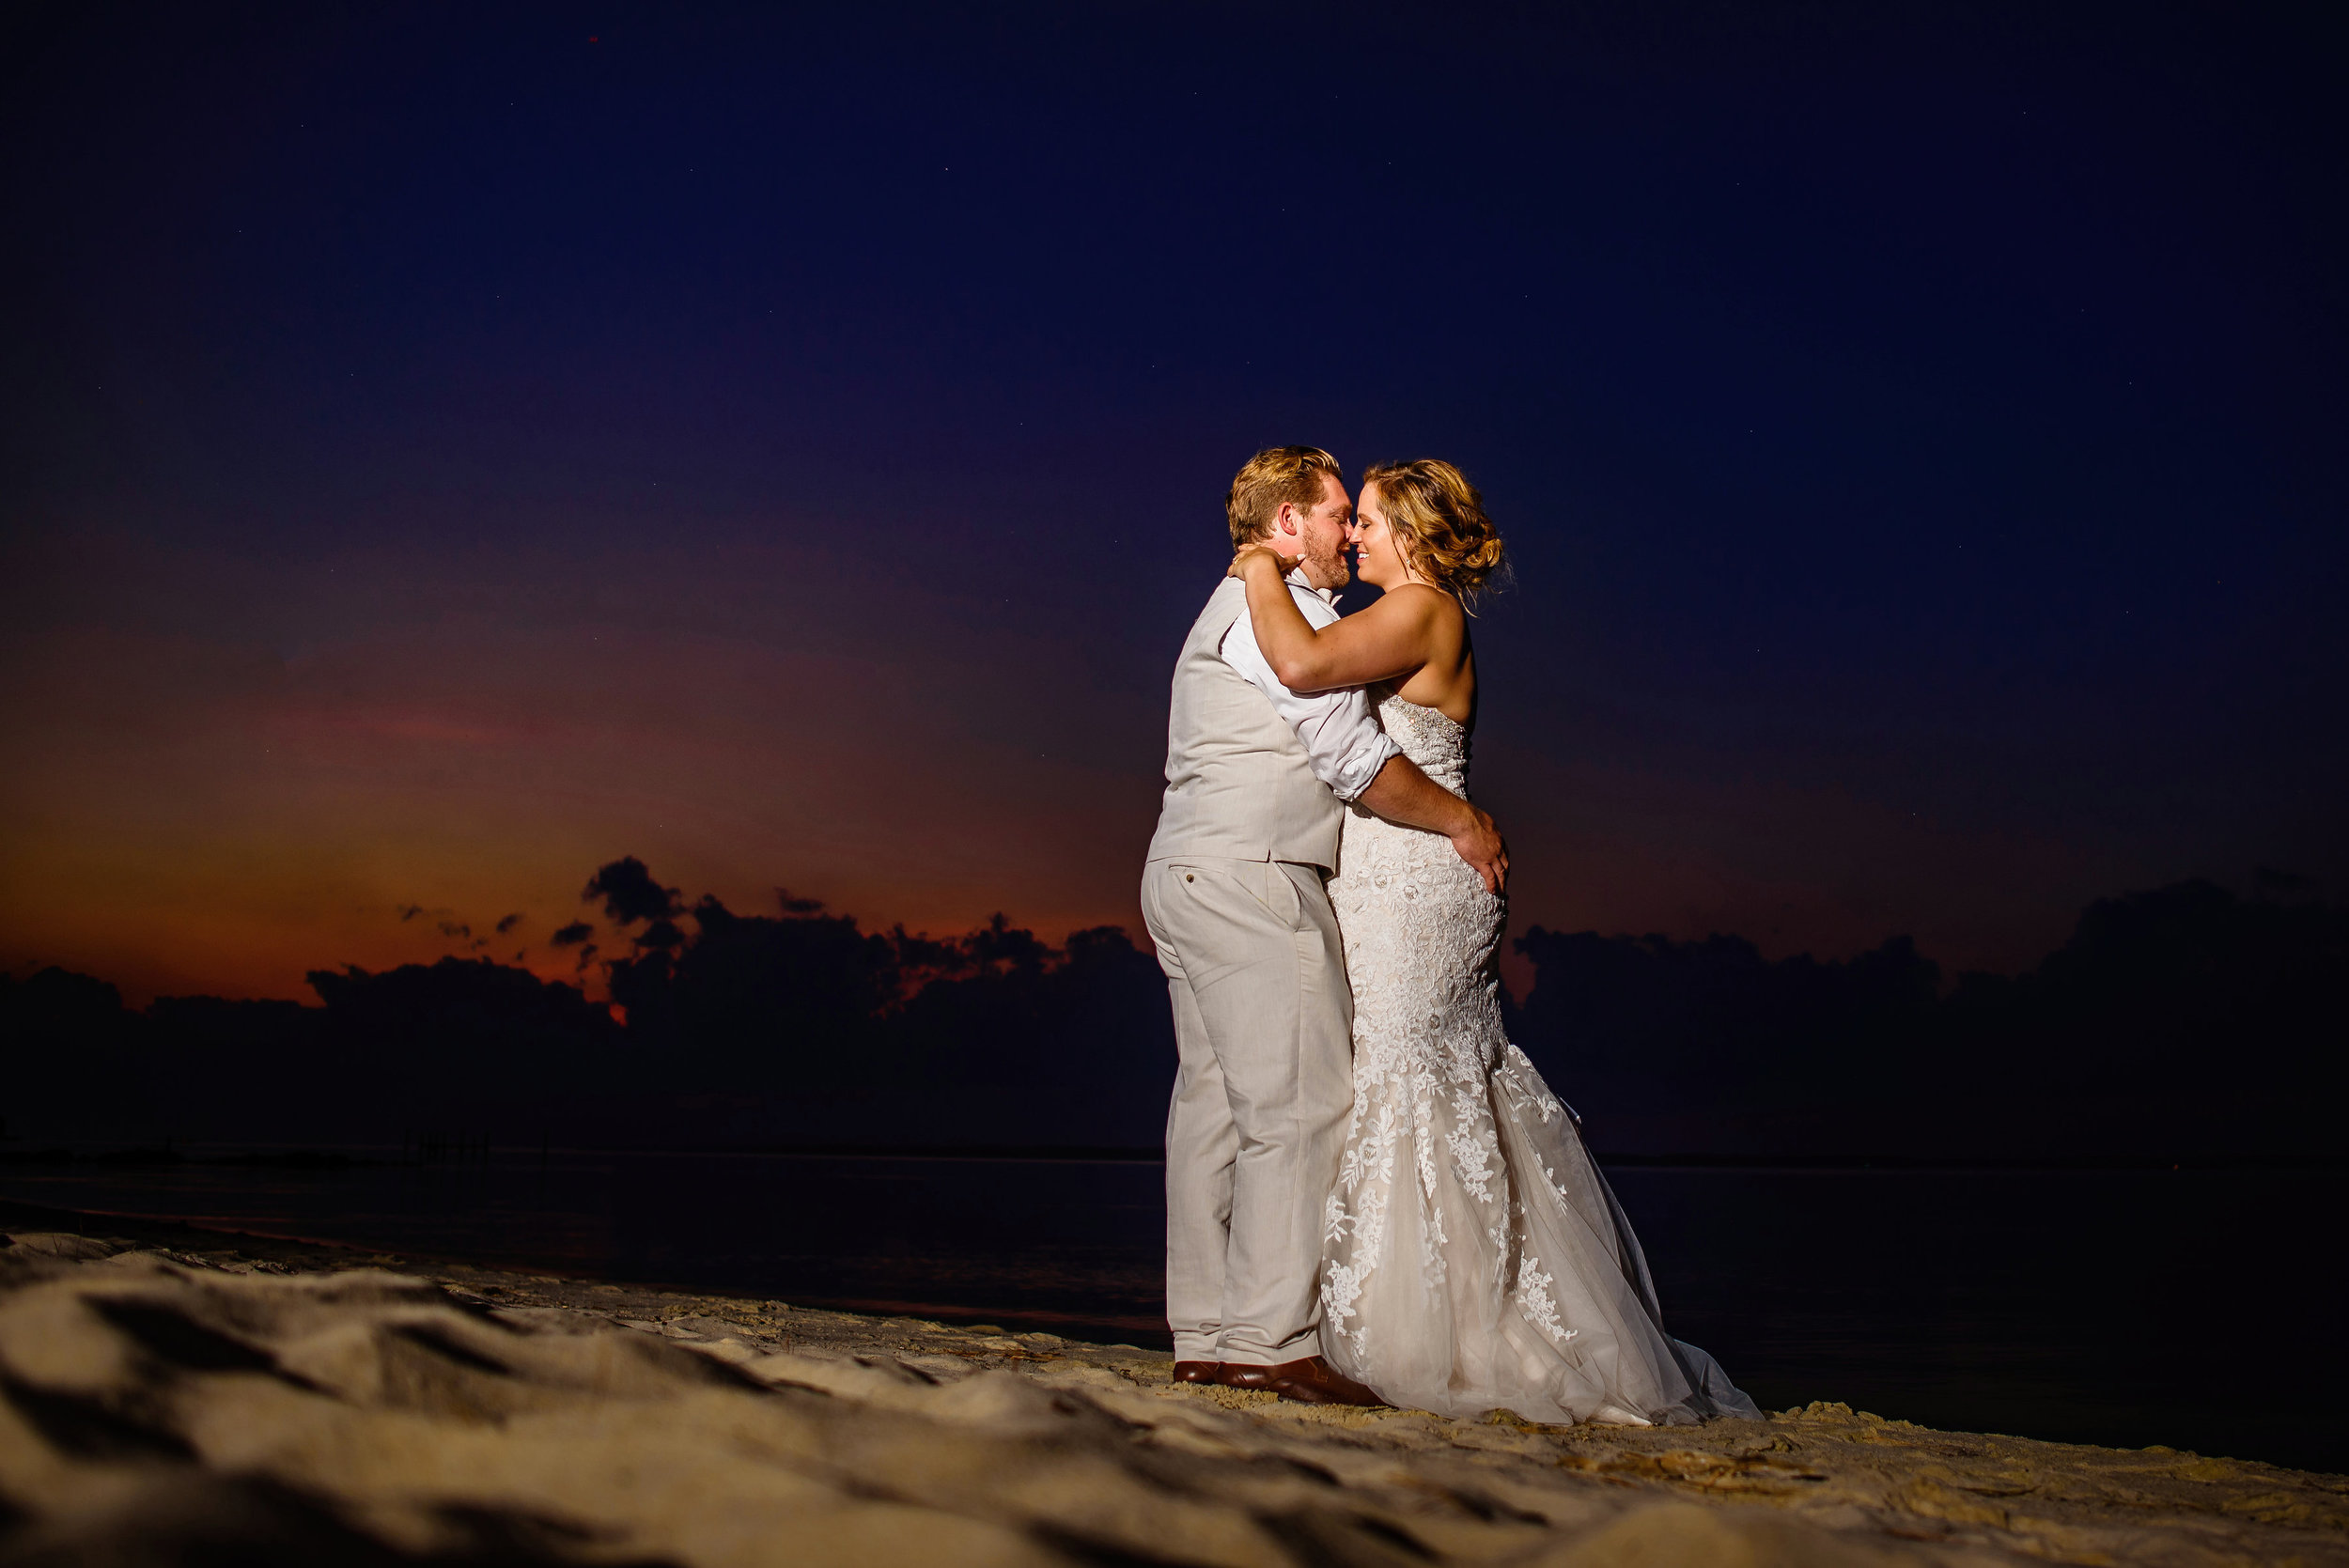 Erica&Jake_Wedding677.jpg